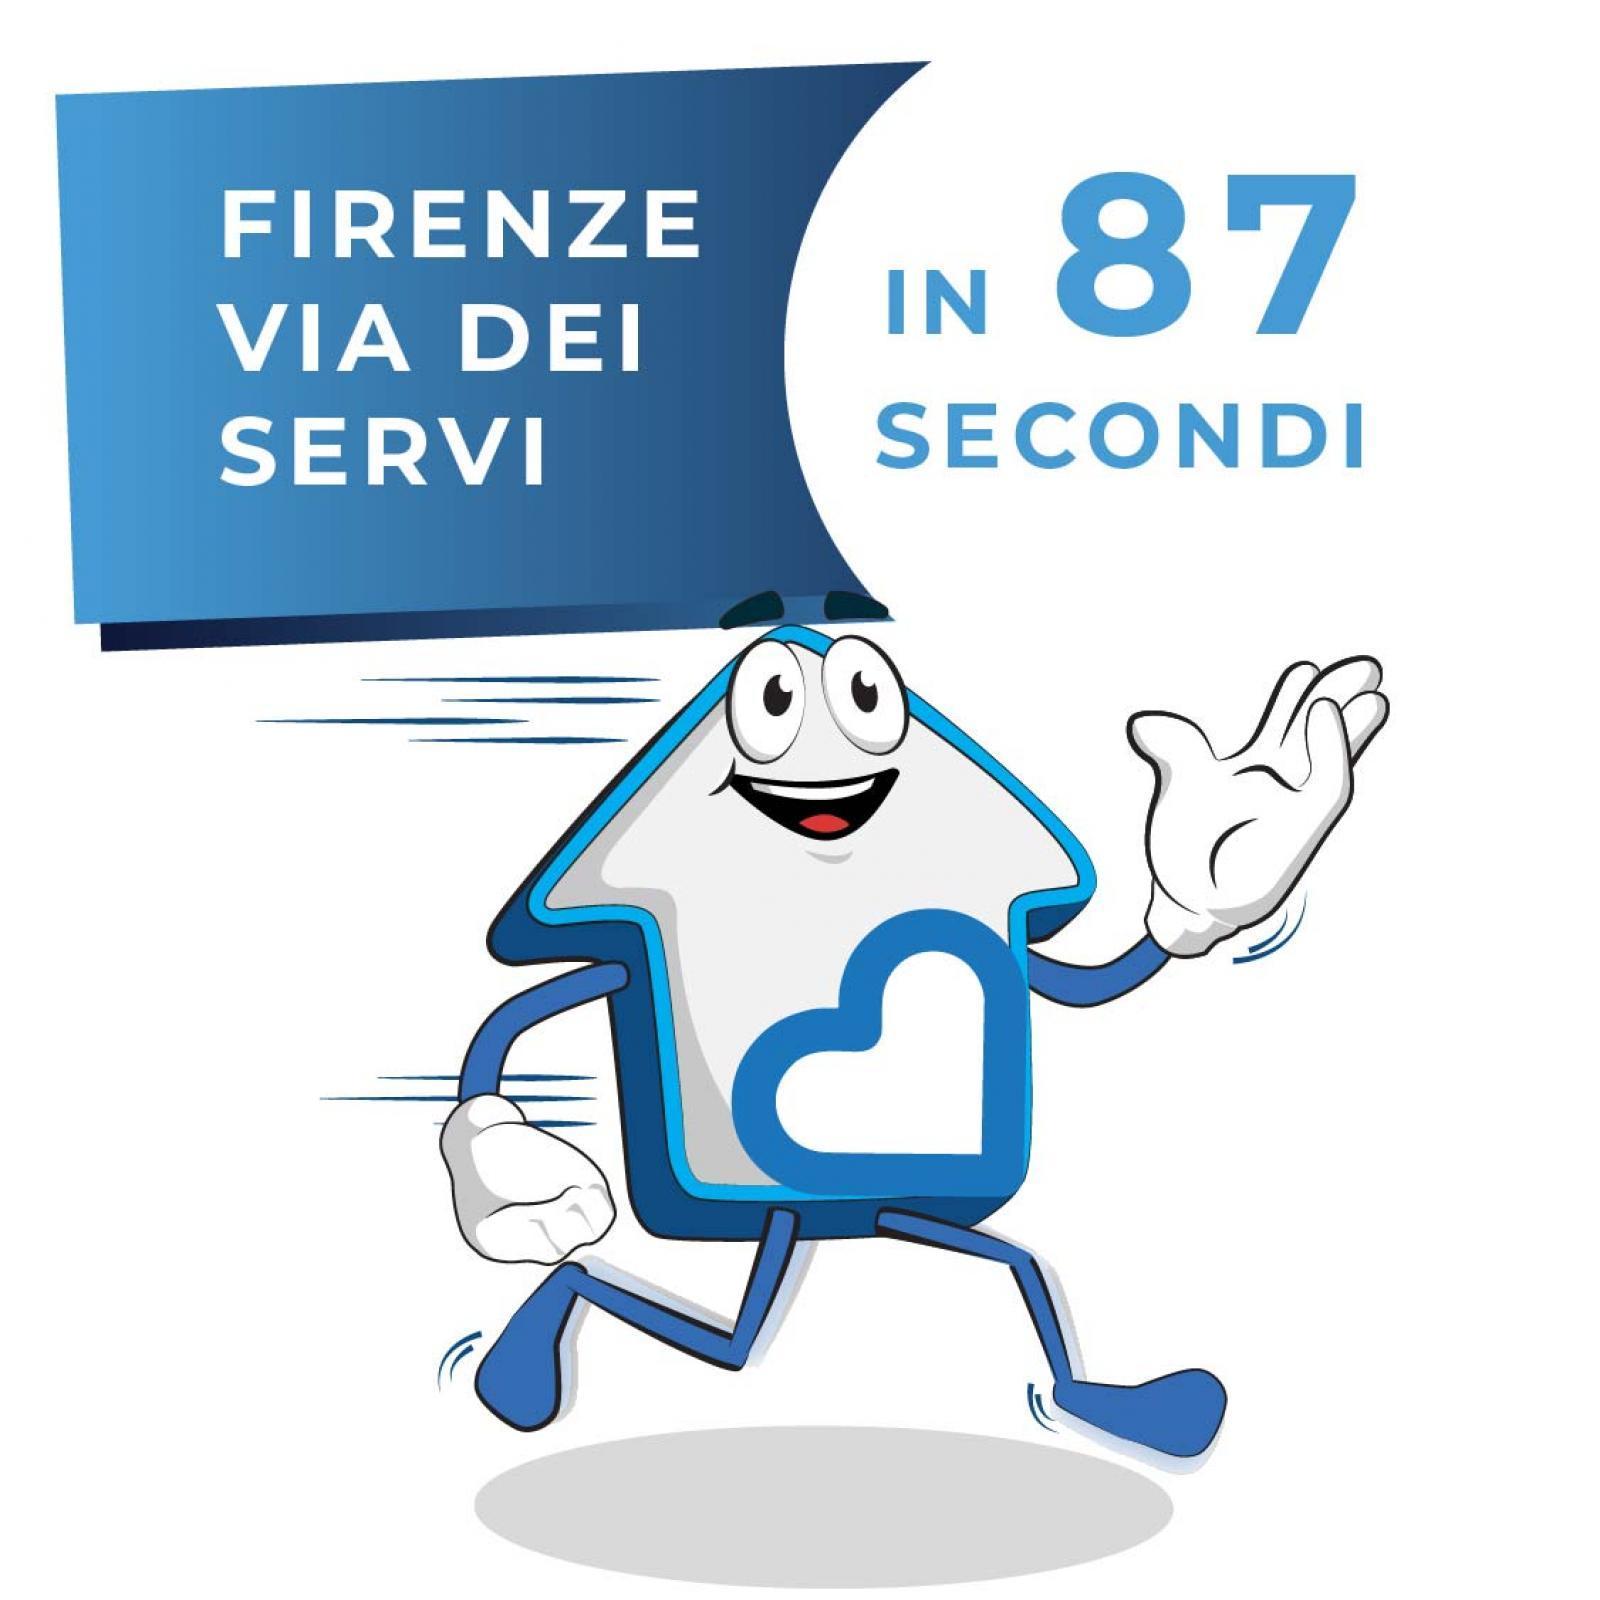 Firenze Via dei servi